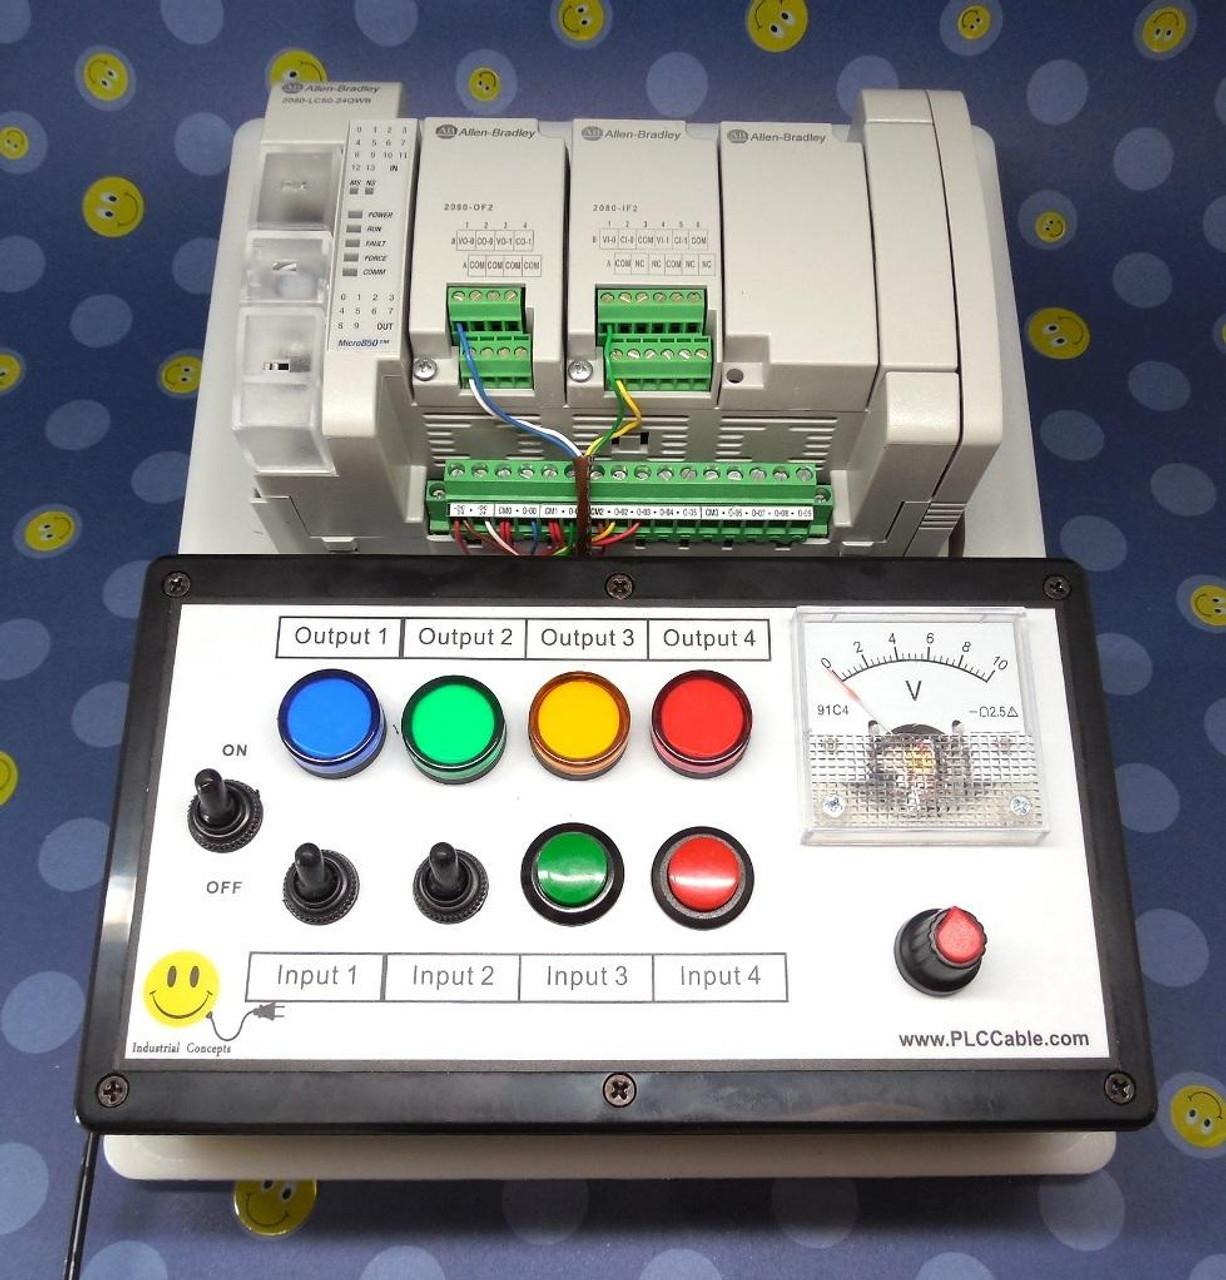 PLC Cables, Inc Allen Bradley Micro850 Programmable CCW PLC Trainer Micro800 Training Kit Ethernet